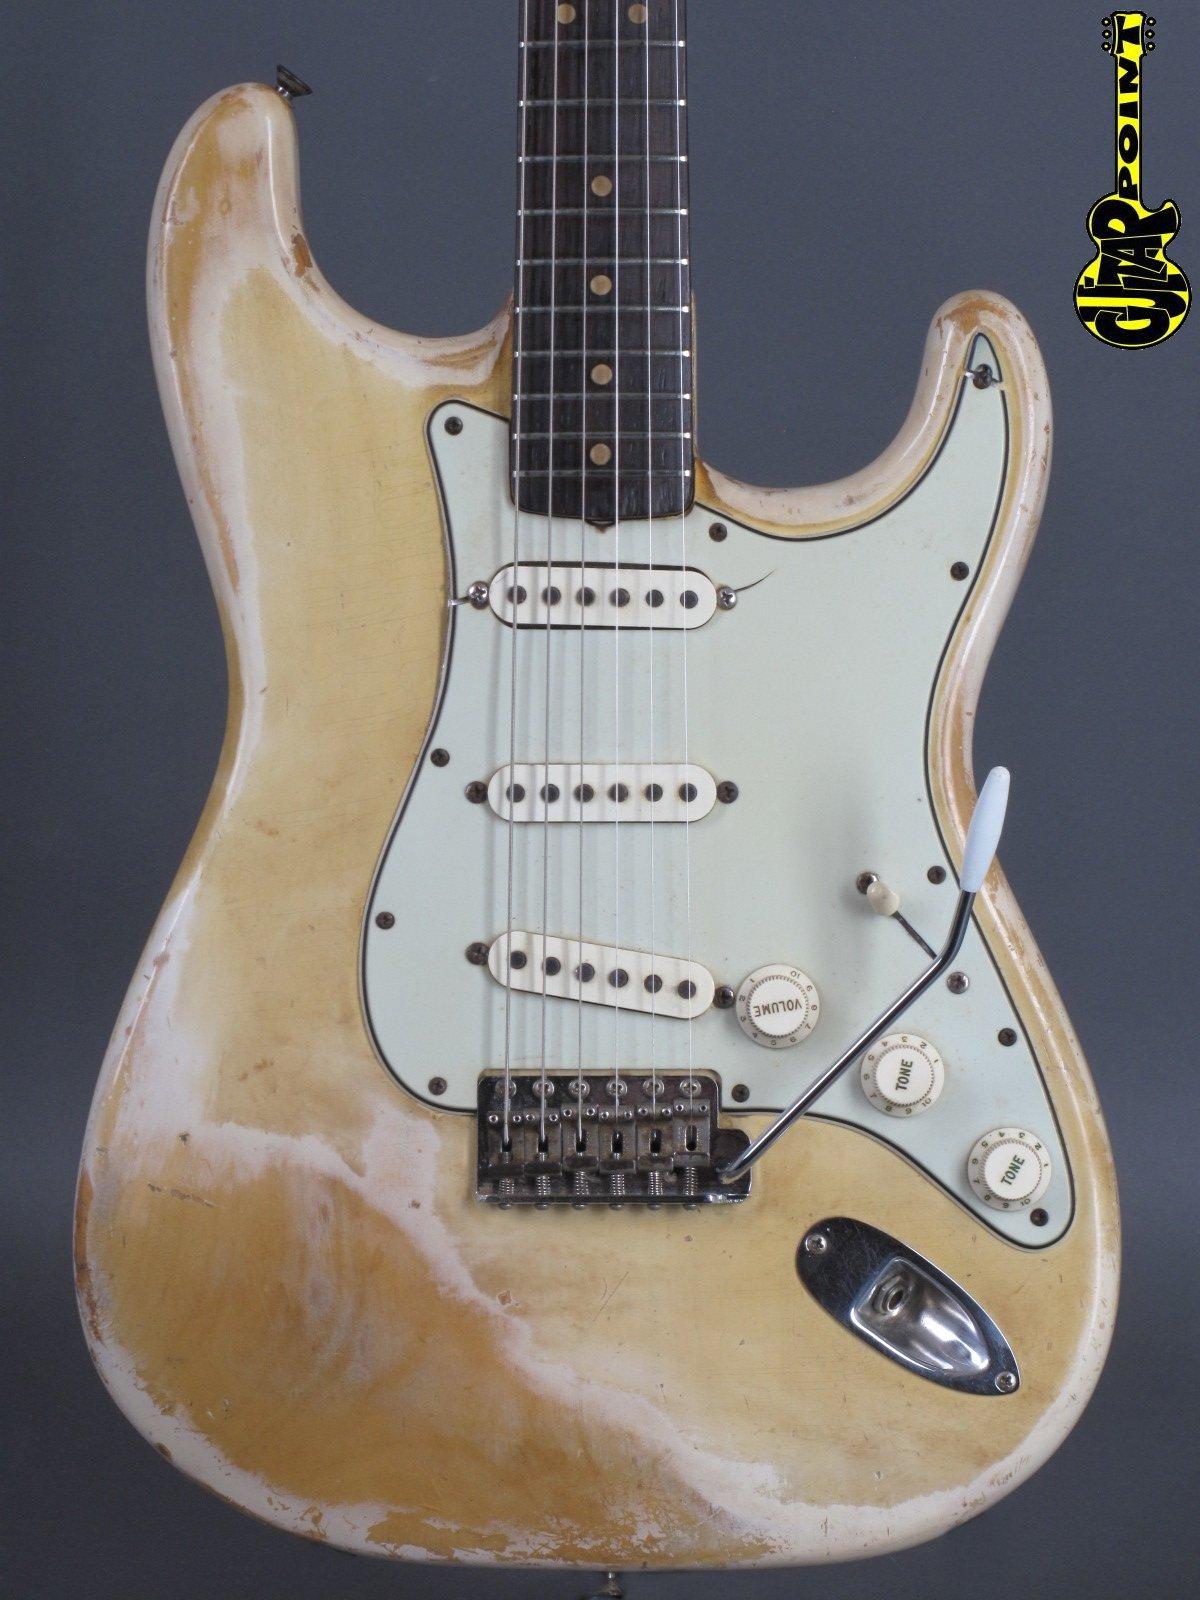 1963 Fender Stratocaster - Blond ...rare and lightweight = 3,19Kg!